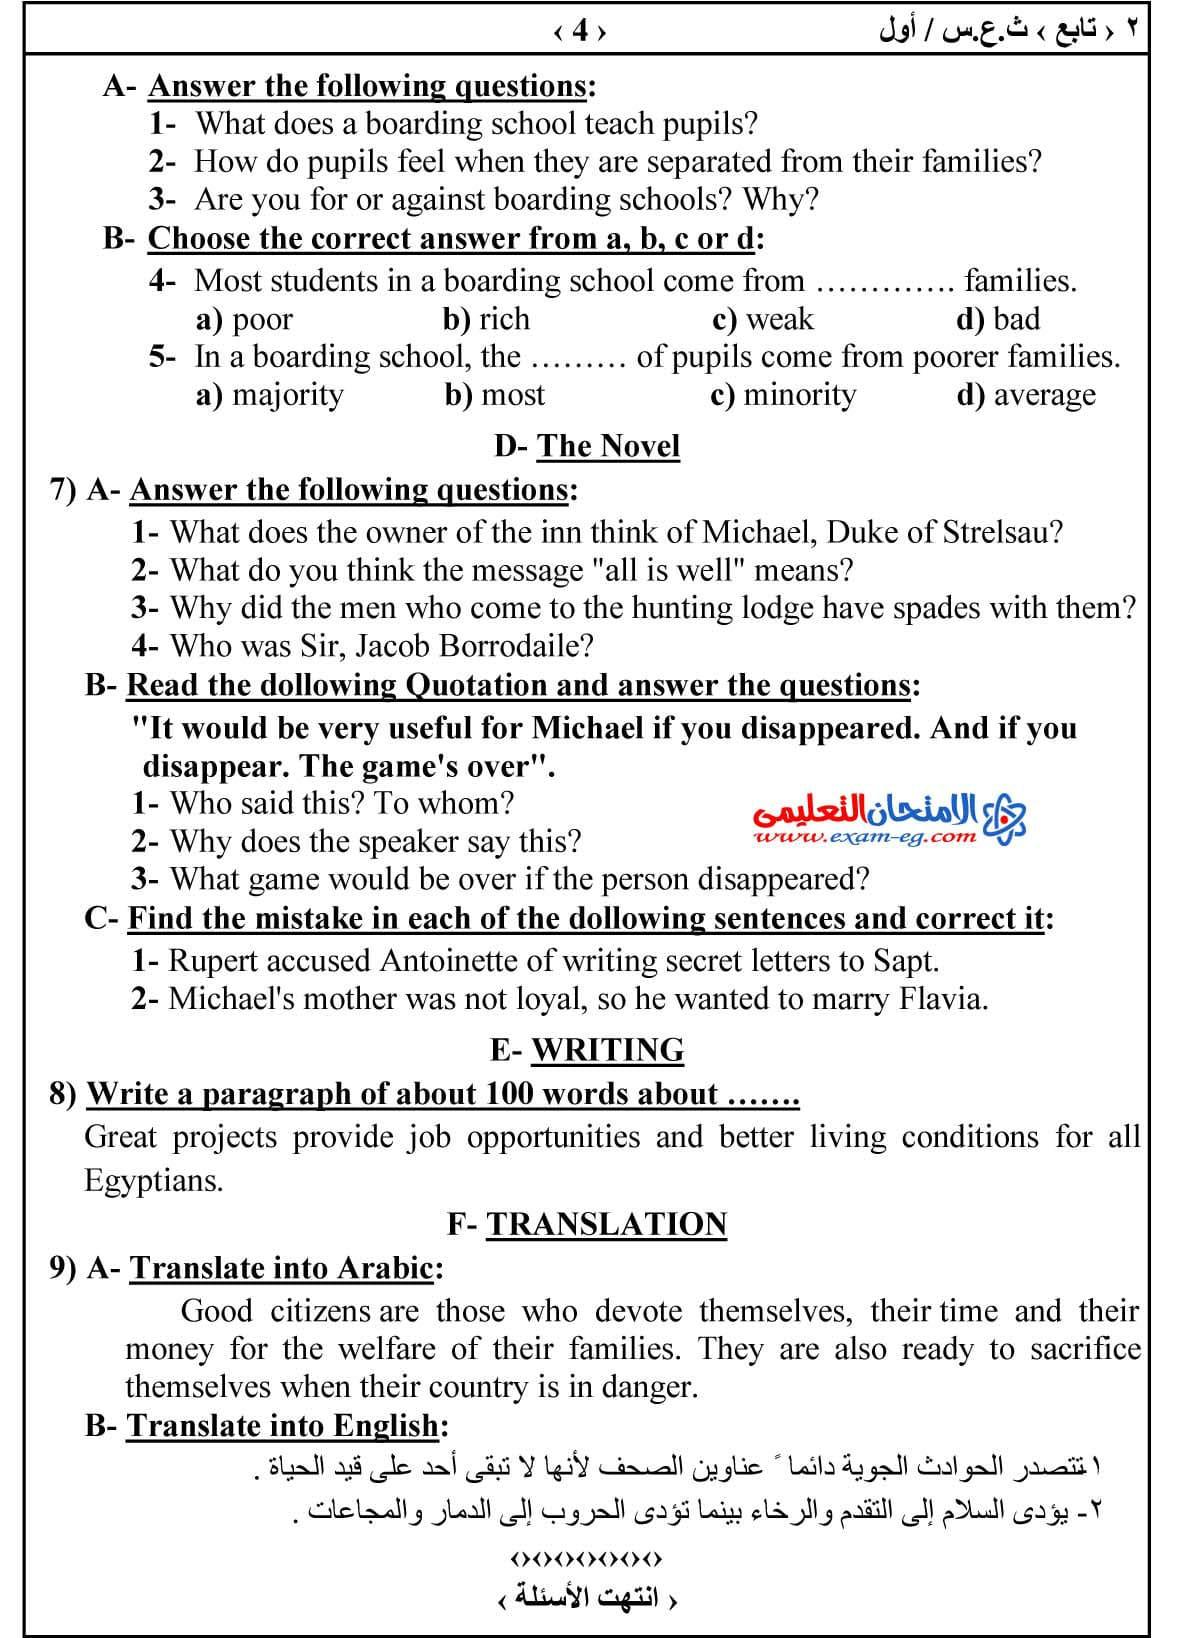 exam-eg.com_1429231072064.jpg